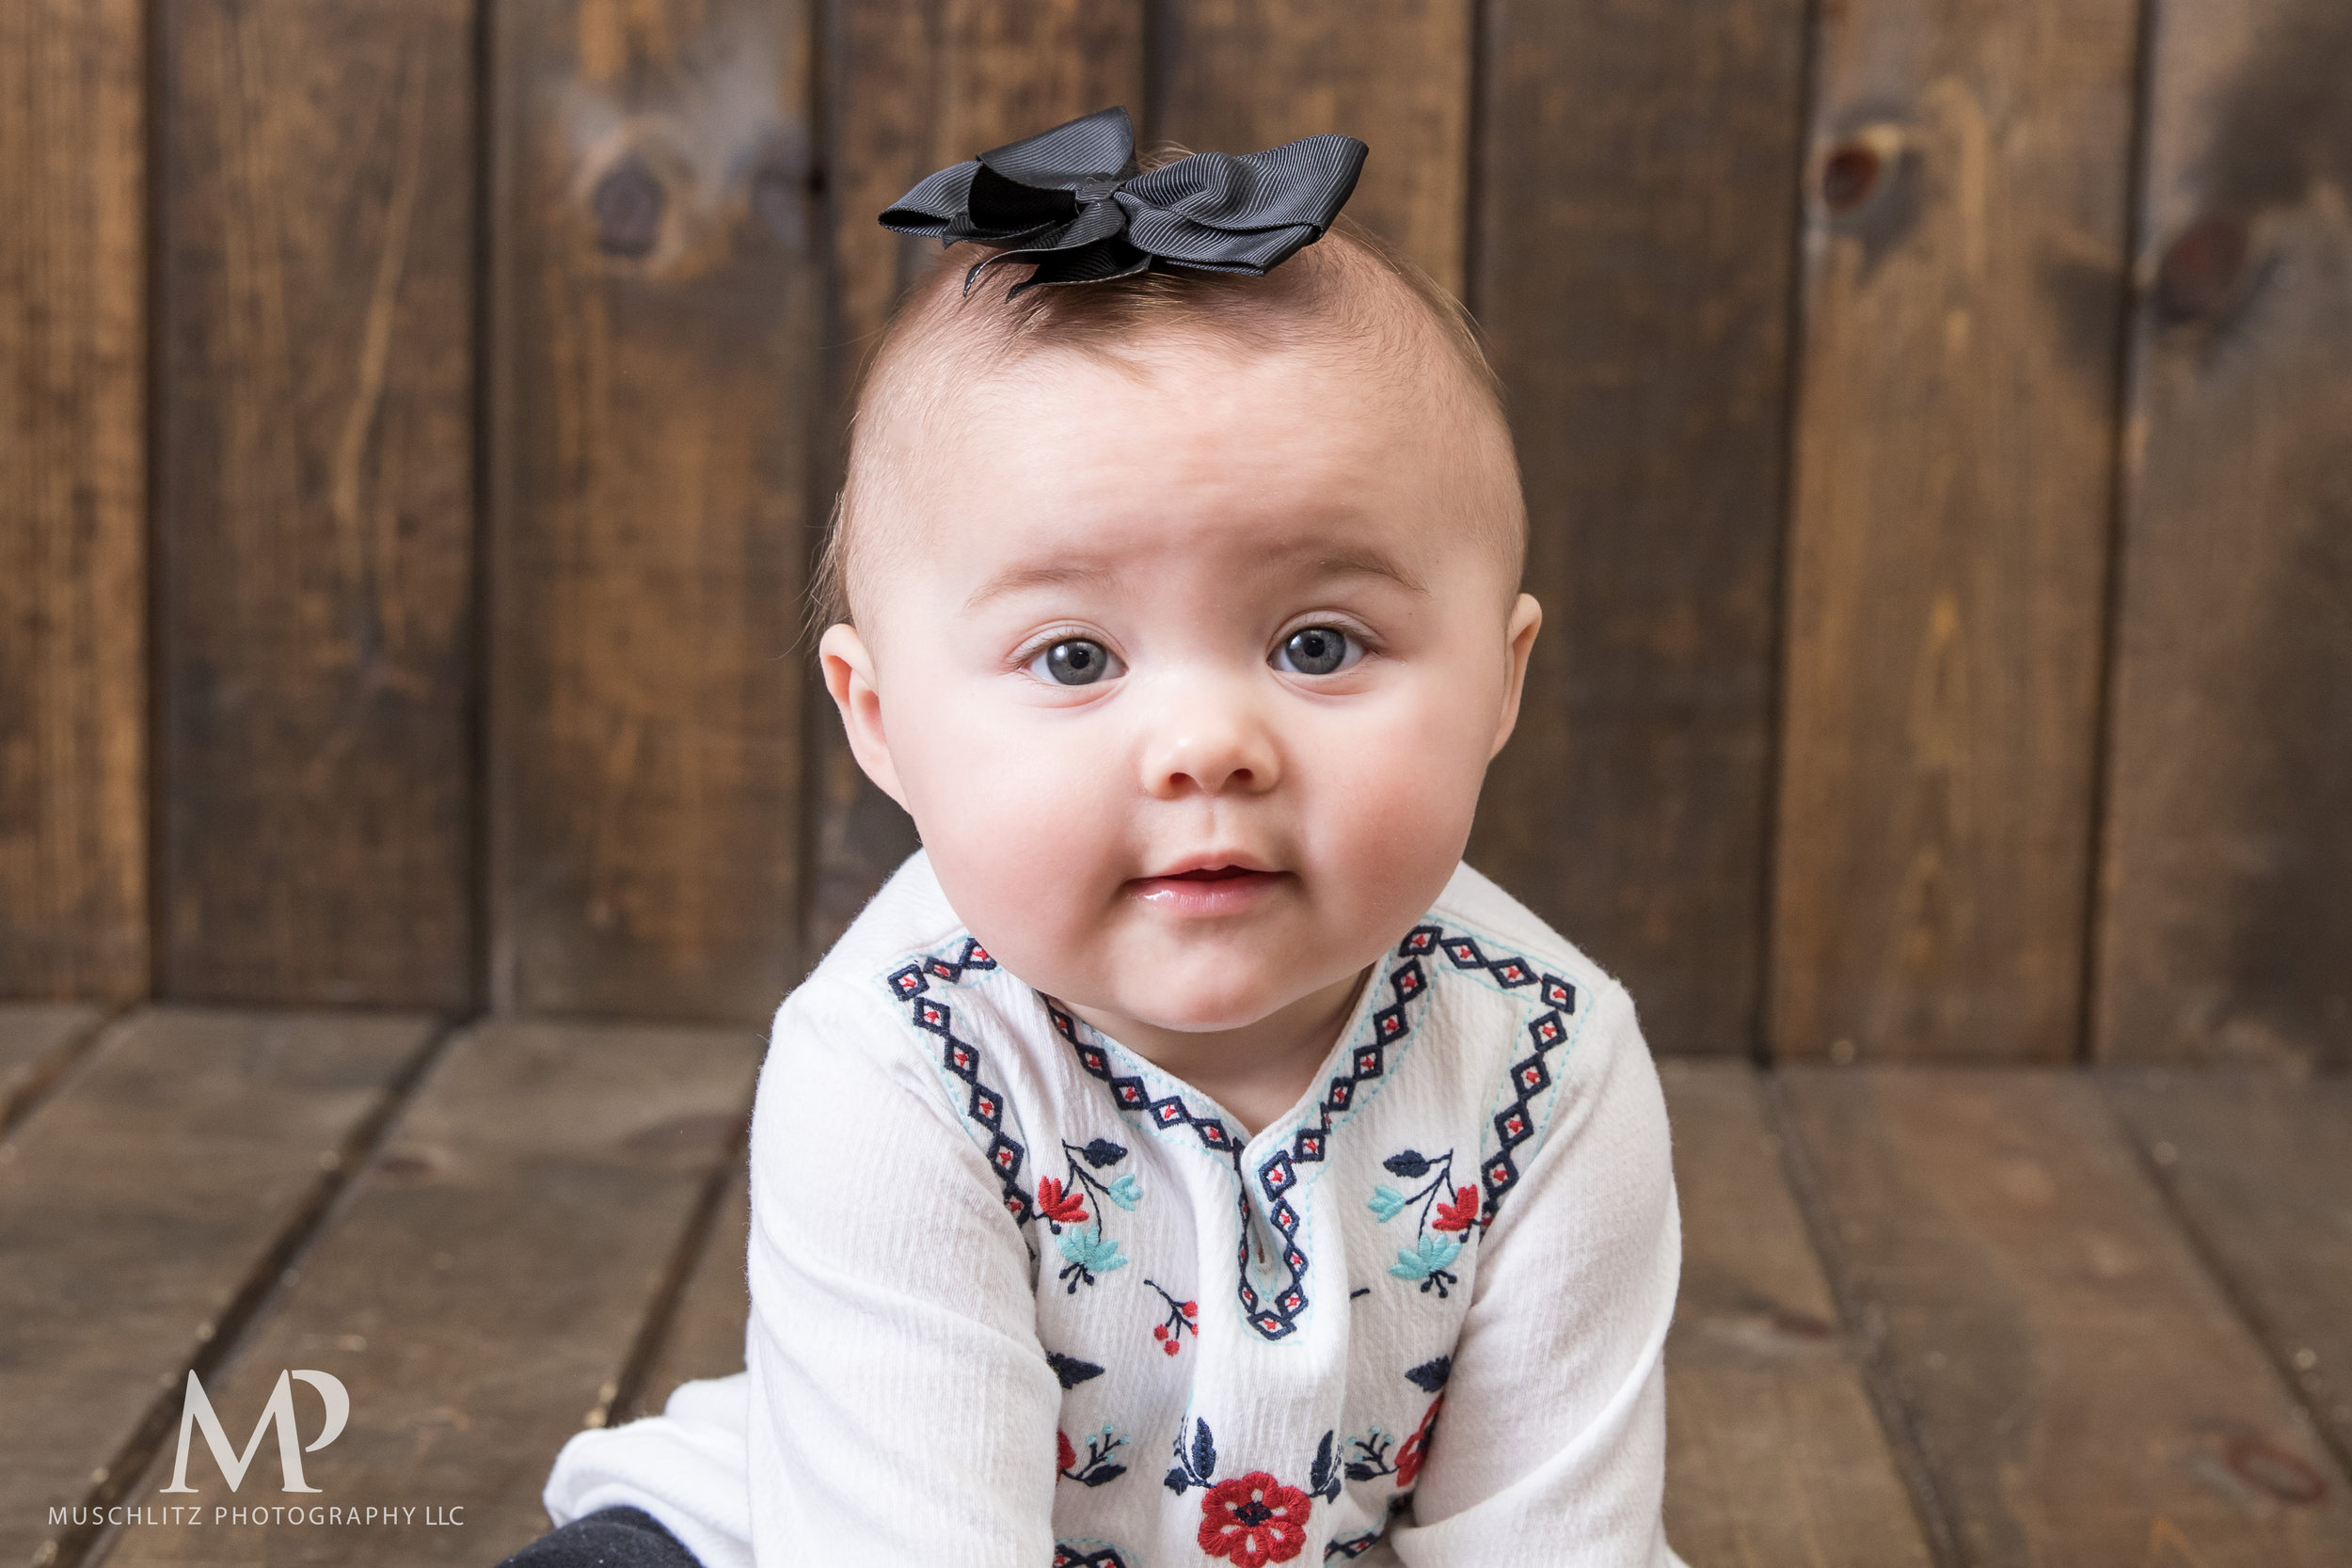 6-month-portraits-baby-photographer-columbus-ohio-gahanna-muschlitz-photography-016.JPG